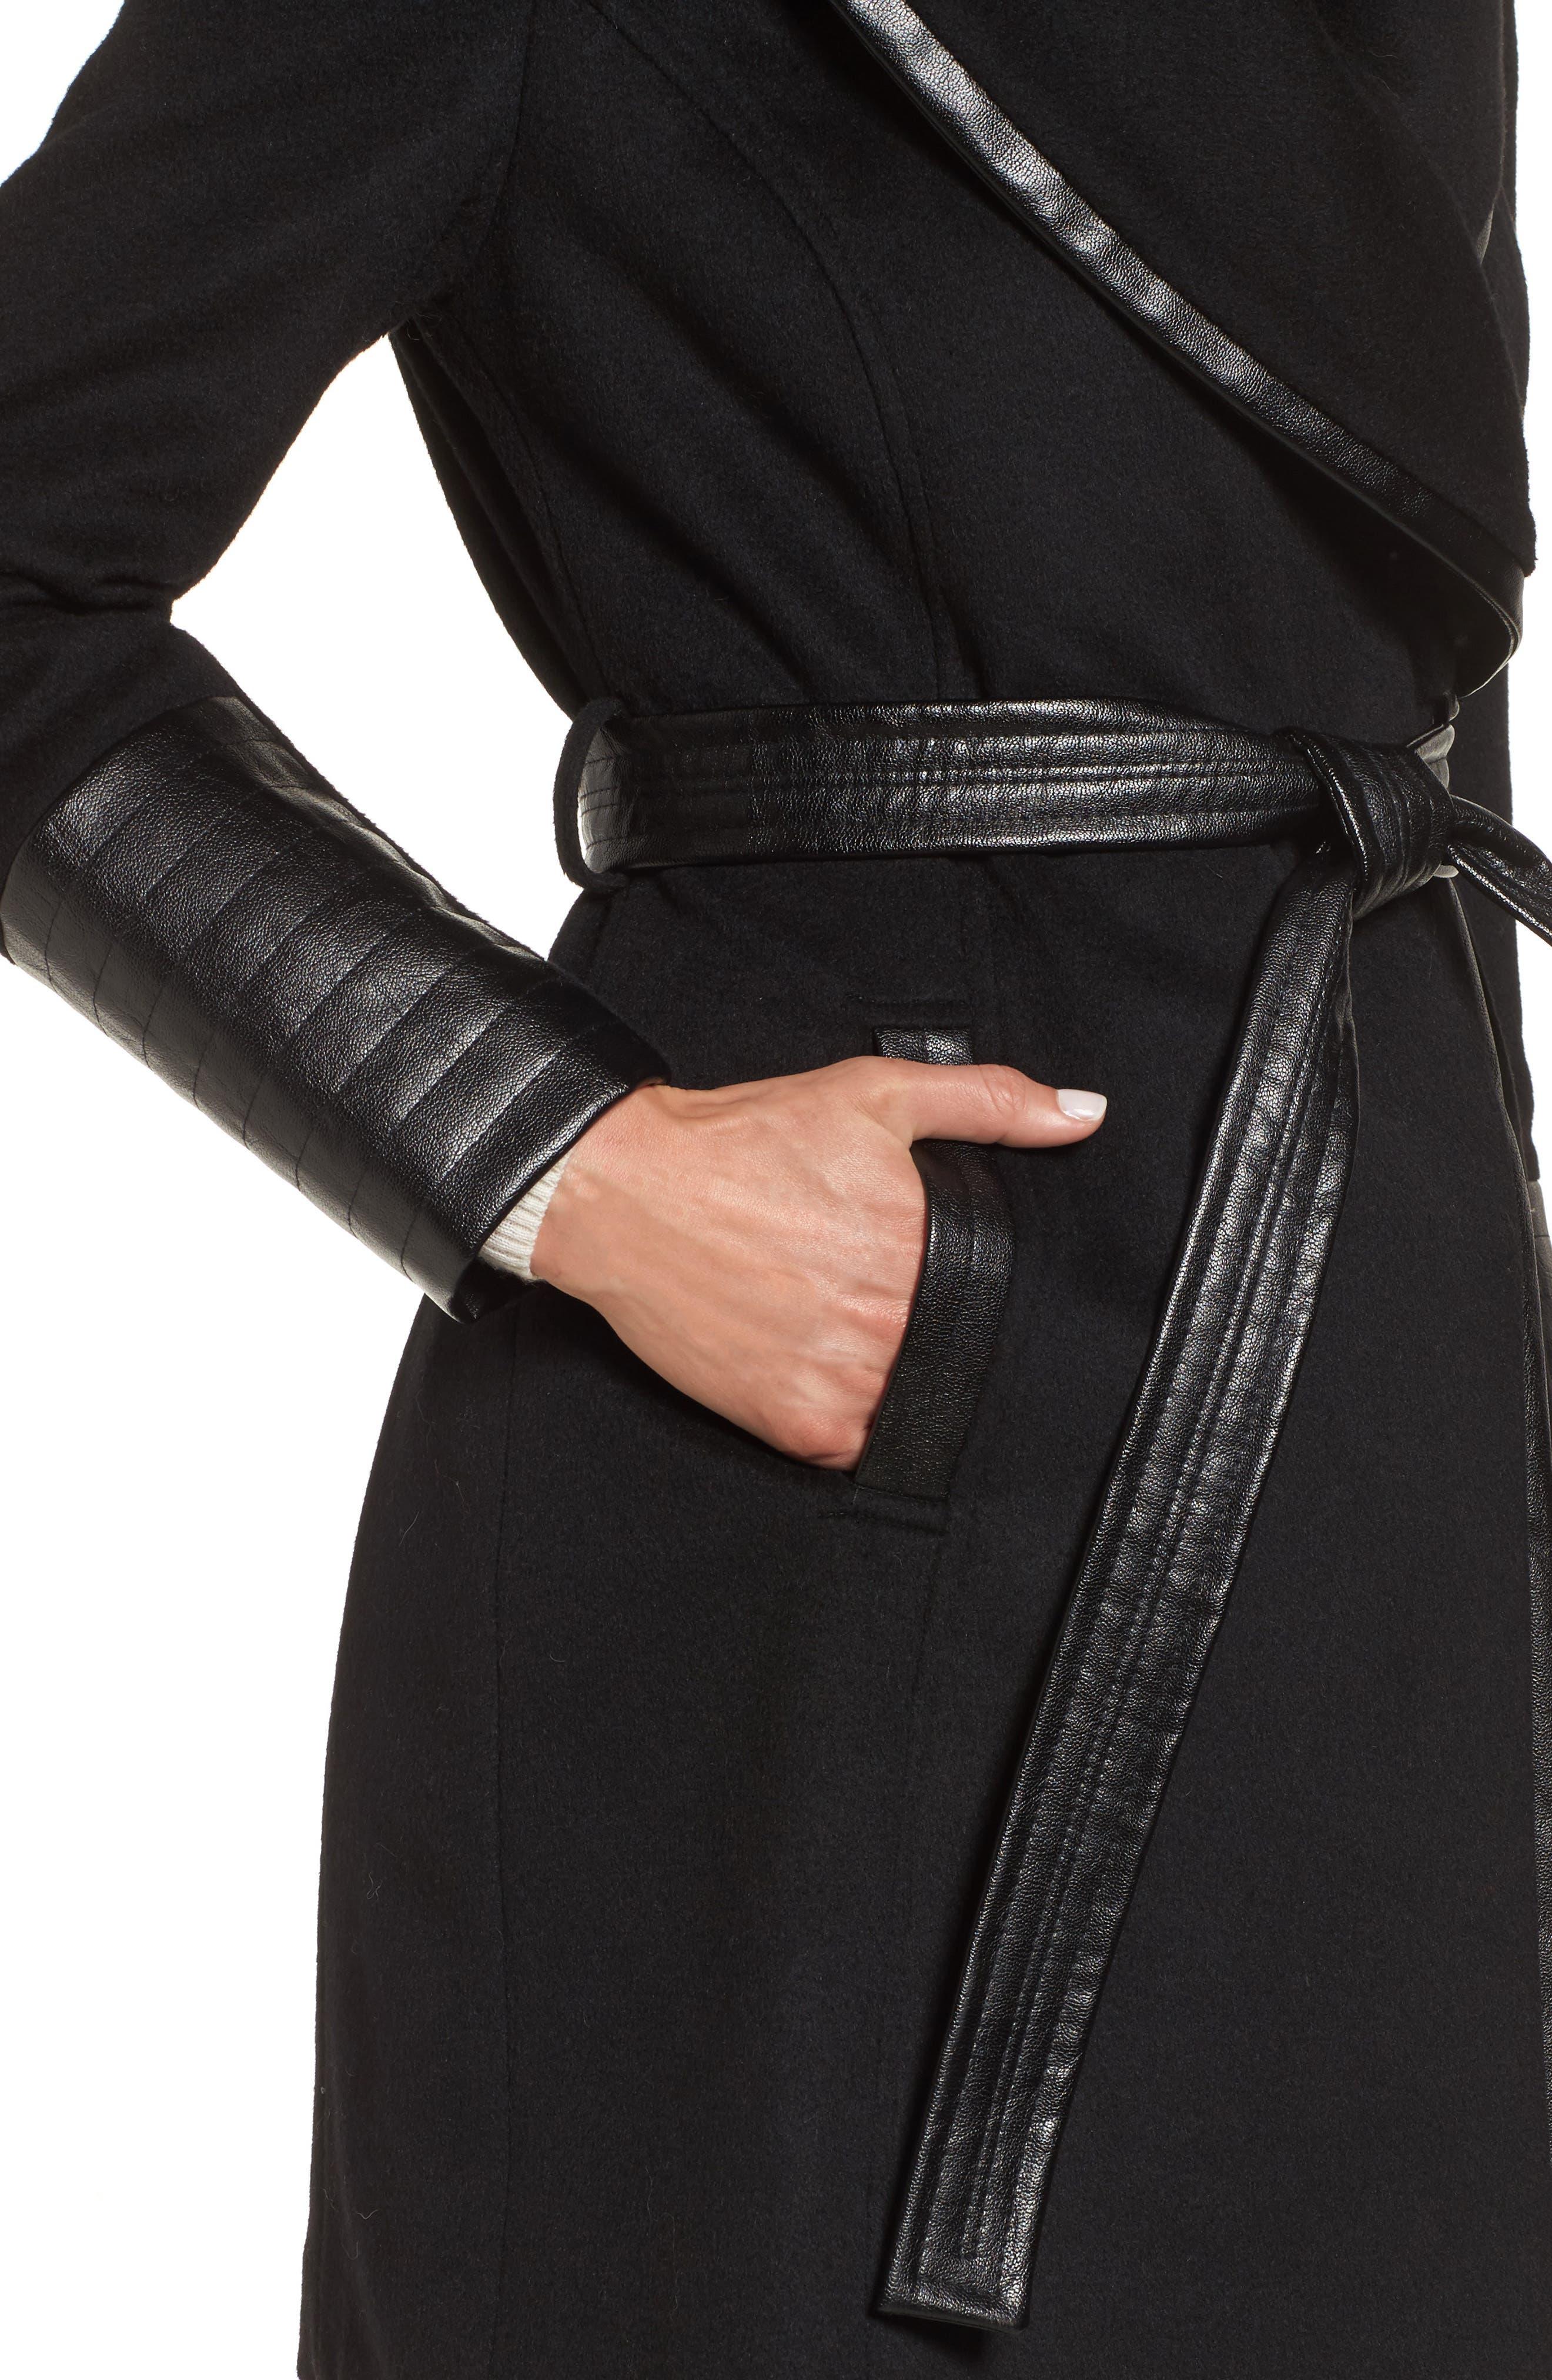 Wool Blend Coat,                             Alternate thumbnail 4, color,                             BLACK